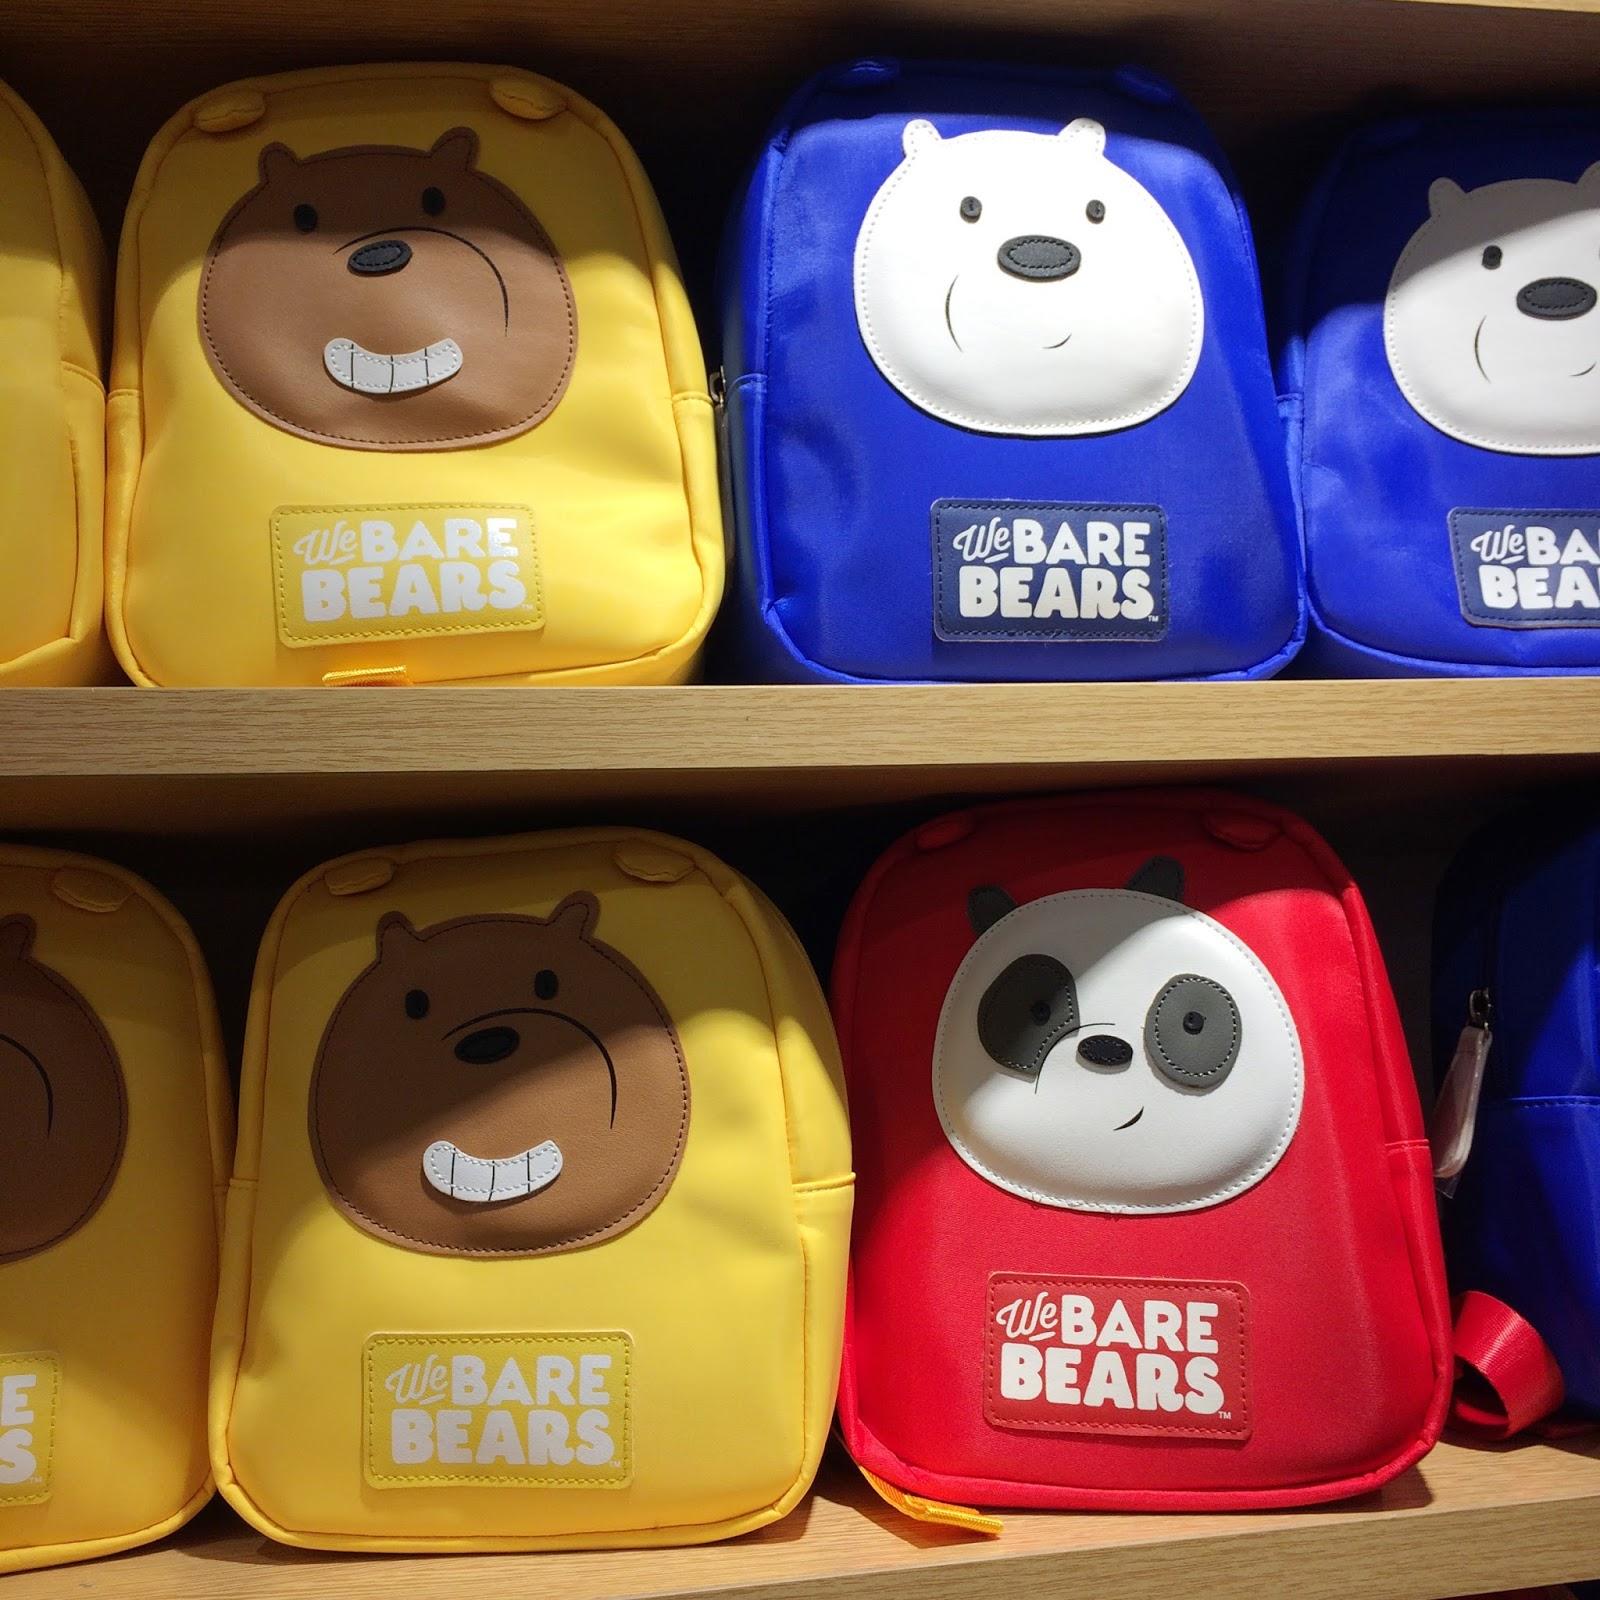 bf2af8192f20 We Bare Bears at Miniso!♥ - ARTSY FARTSY AVA